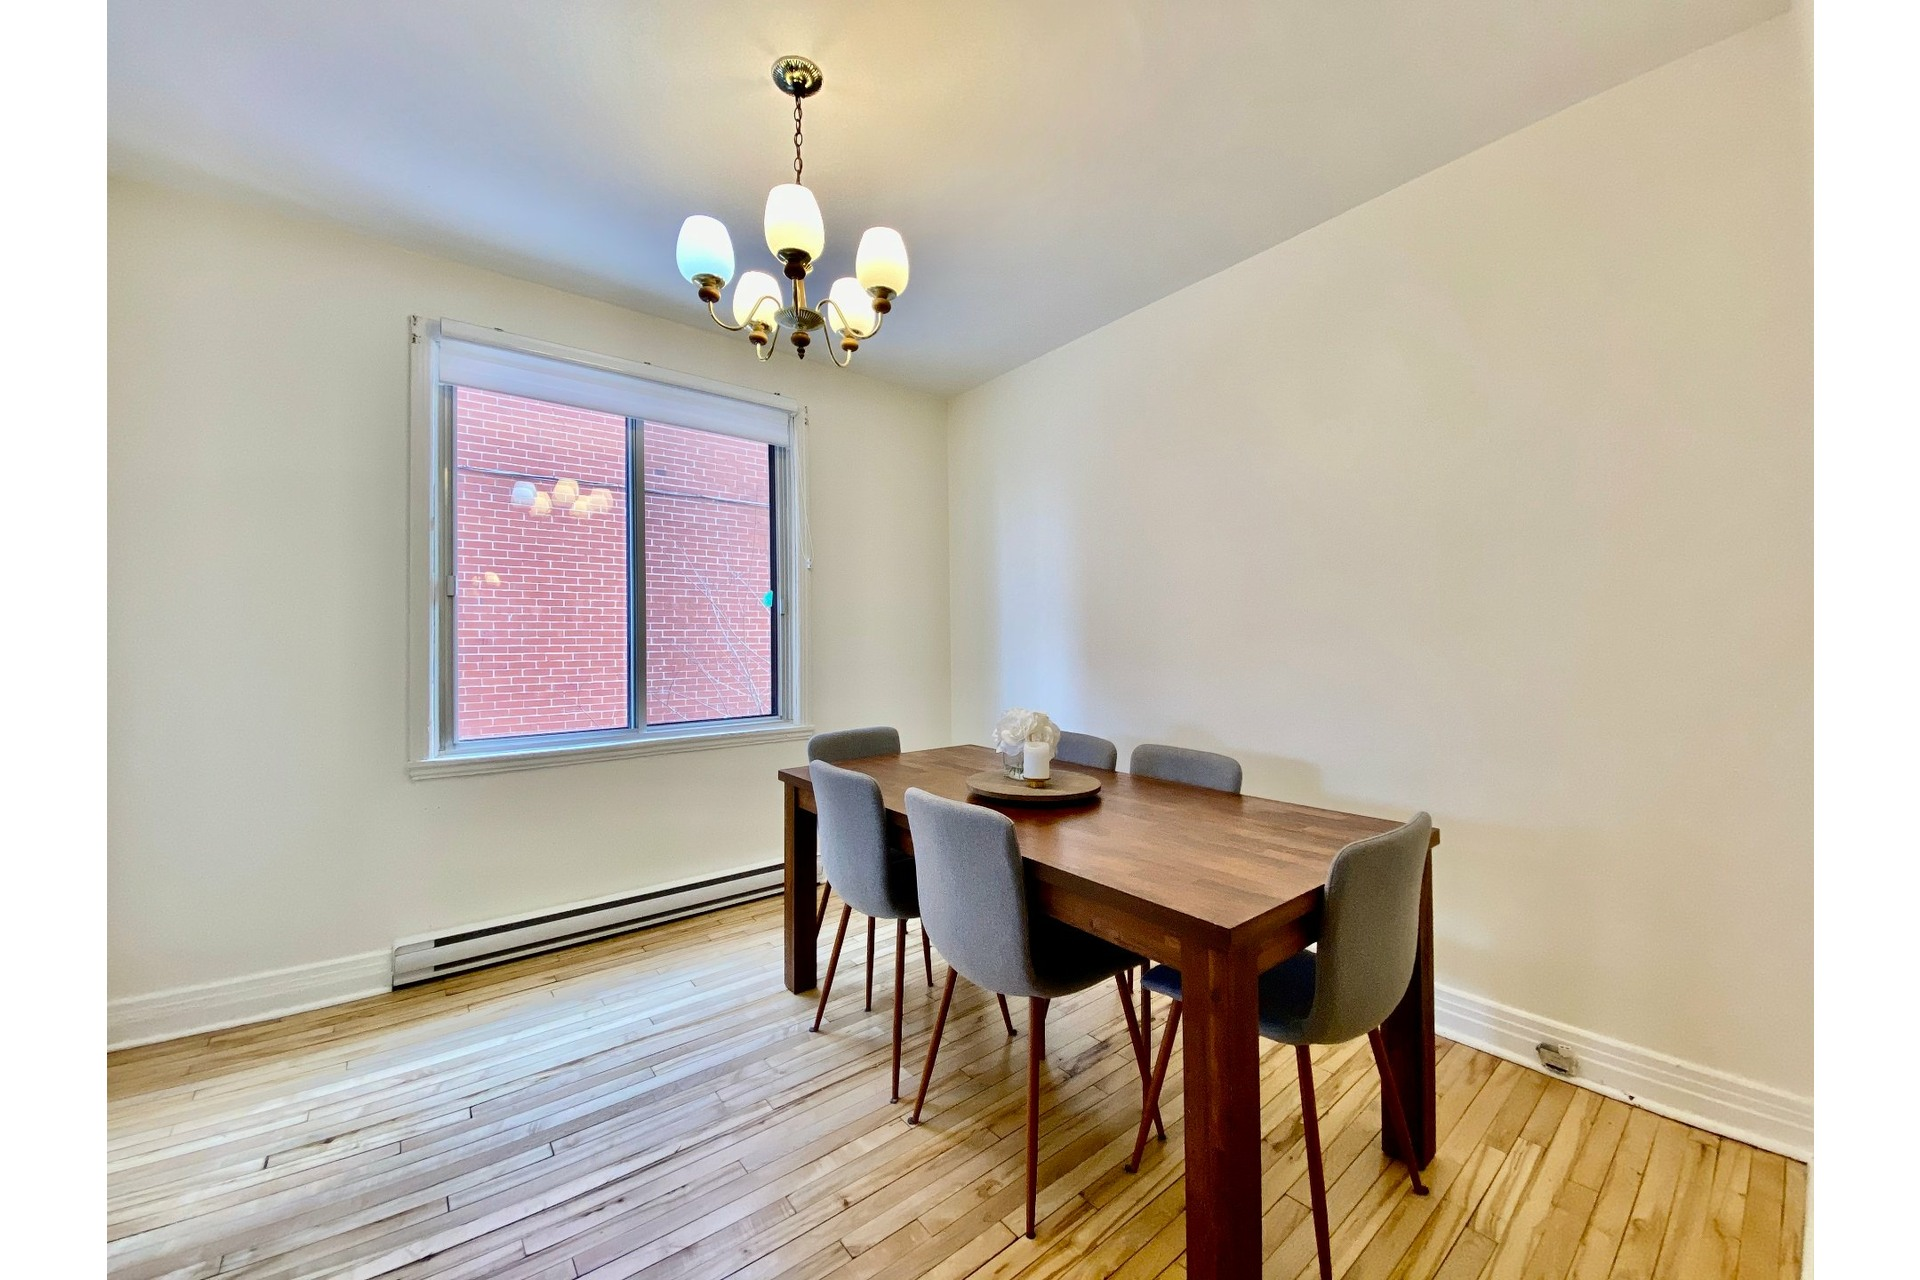 image 7 - Duplex En venta Lachine Montréal  - 6 habitaciones